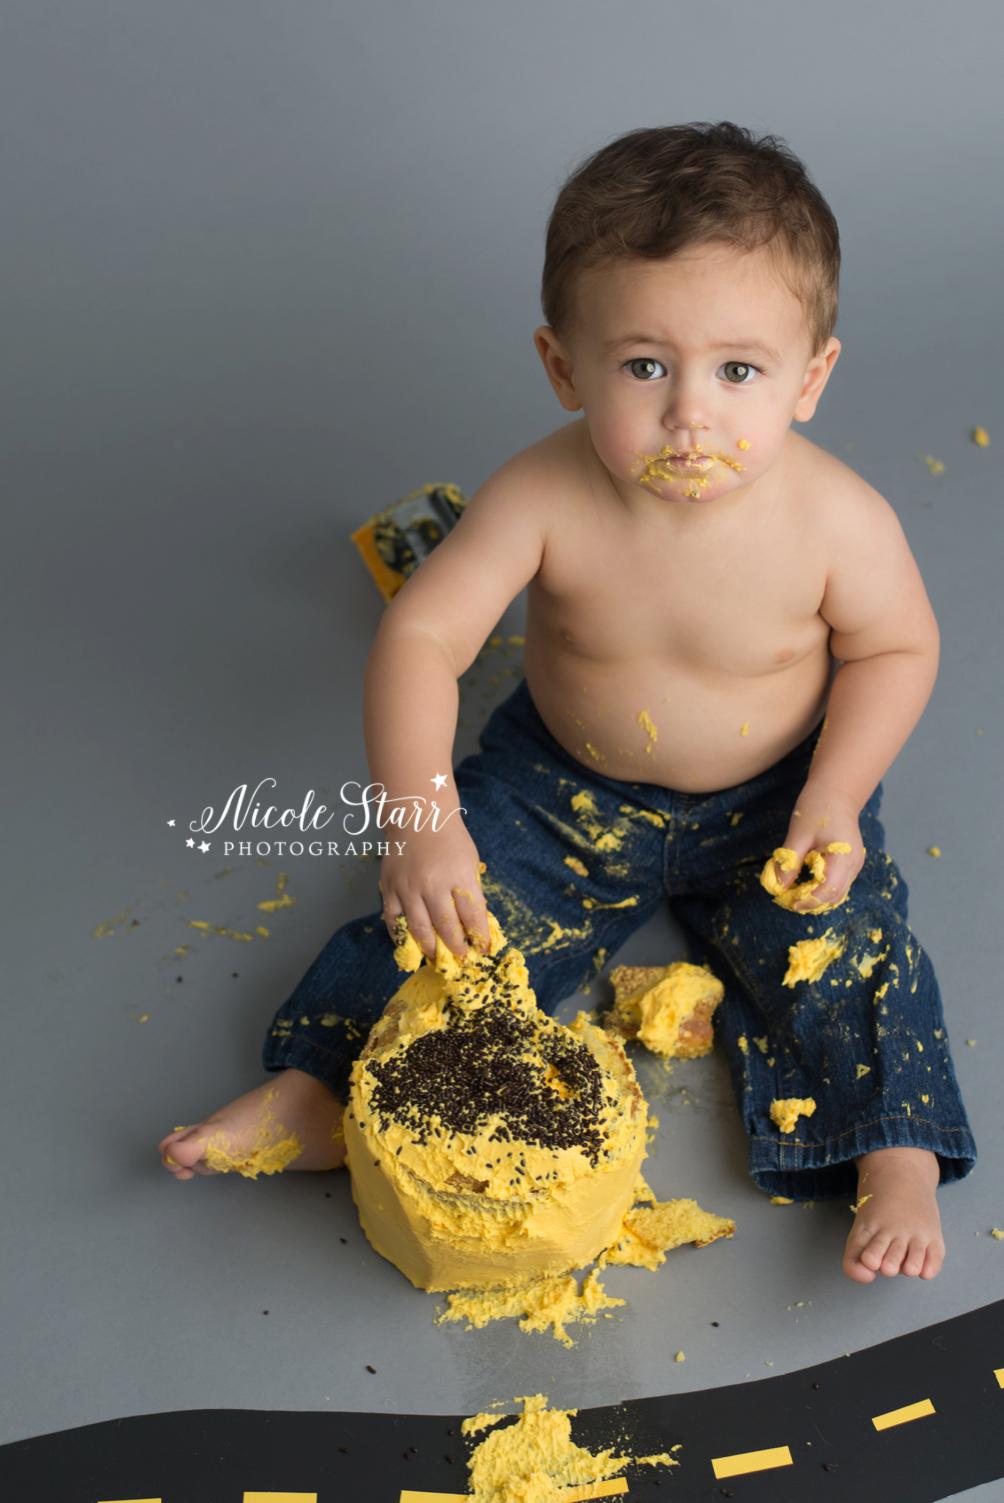 upstate new york saratoga albany cake smash first birthday baby photographer_0015.jpg